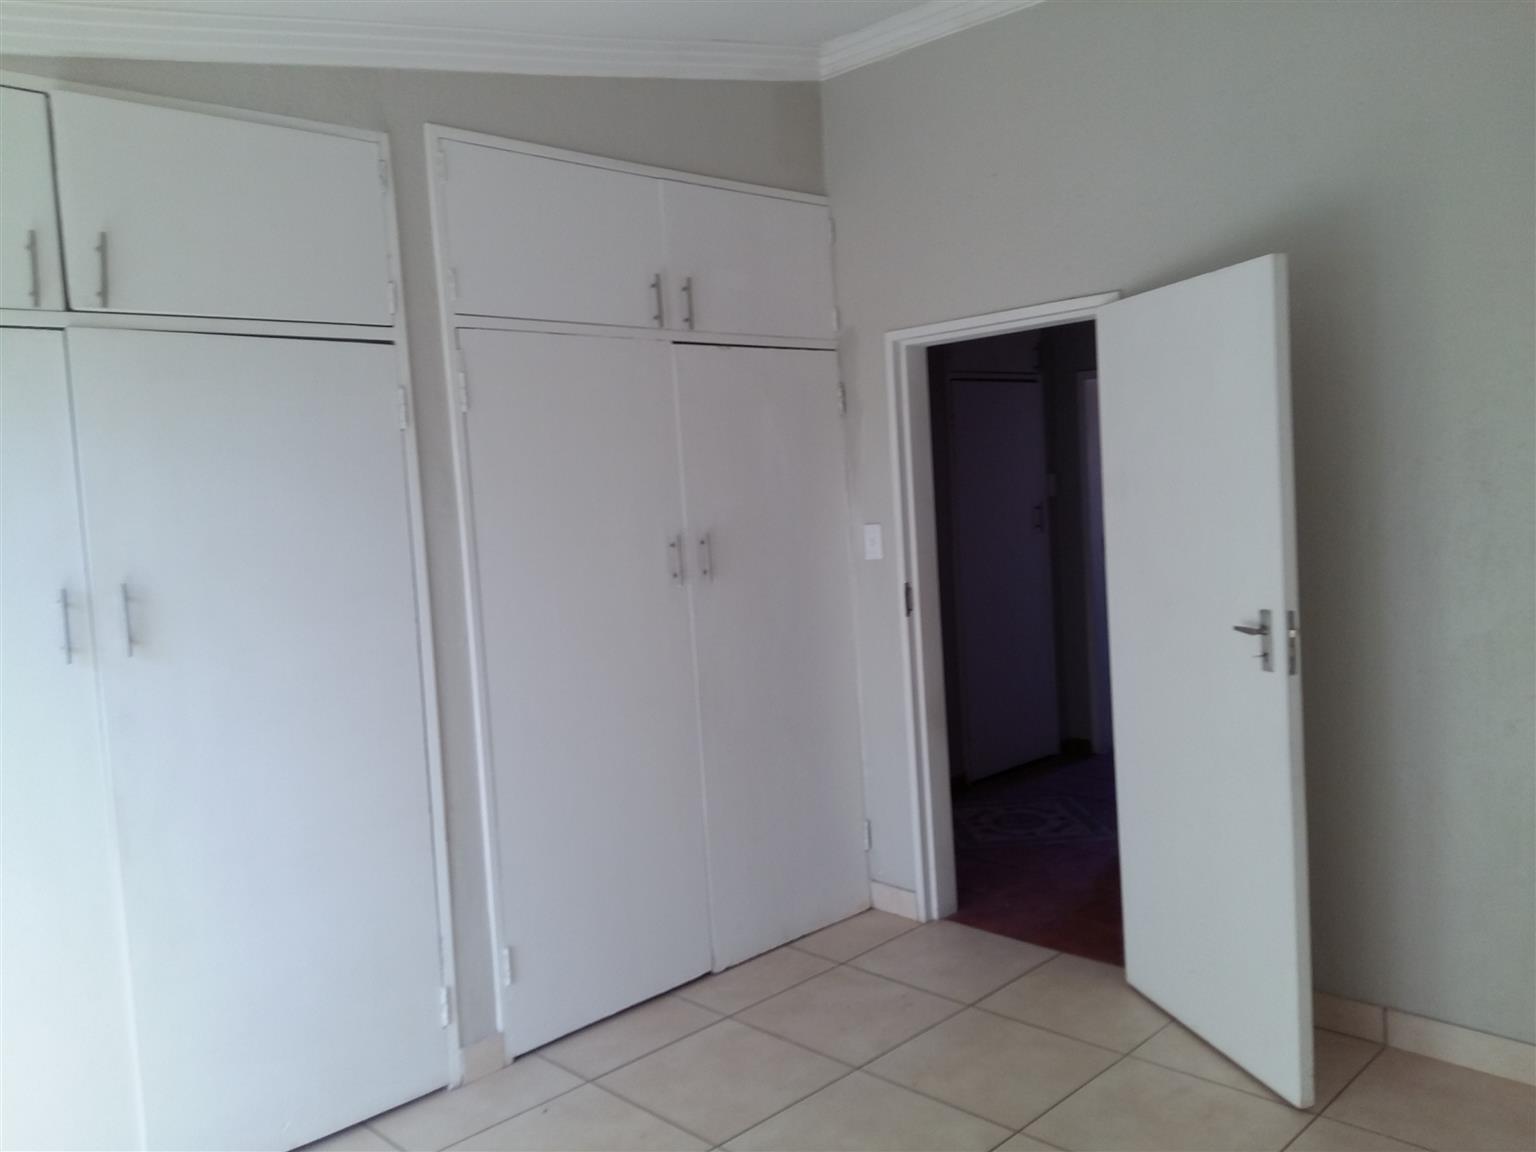 Gezina ( Moot) 2 Bedroom Garden flat R688 w /lights included